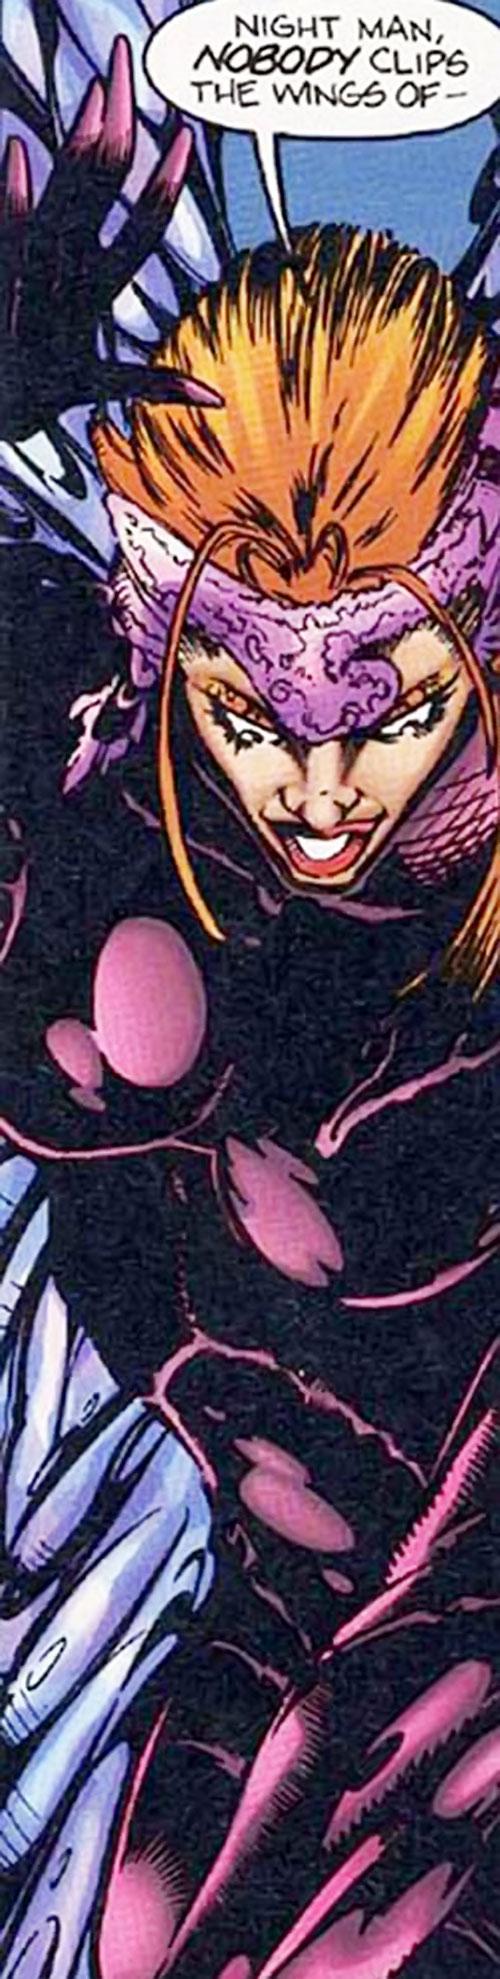 Bloodfly (Night Man enemy) (Ultraverse comics)